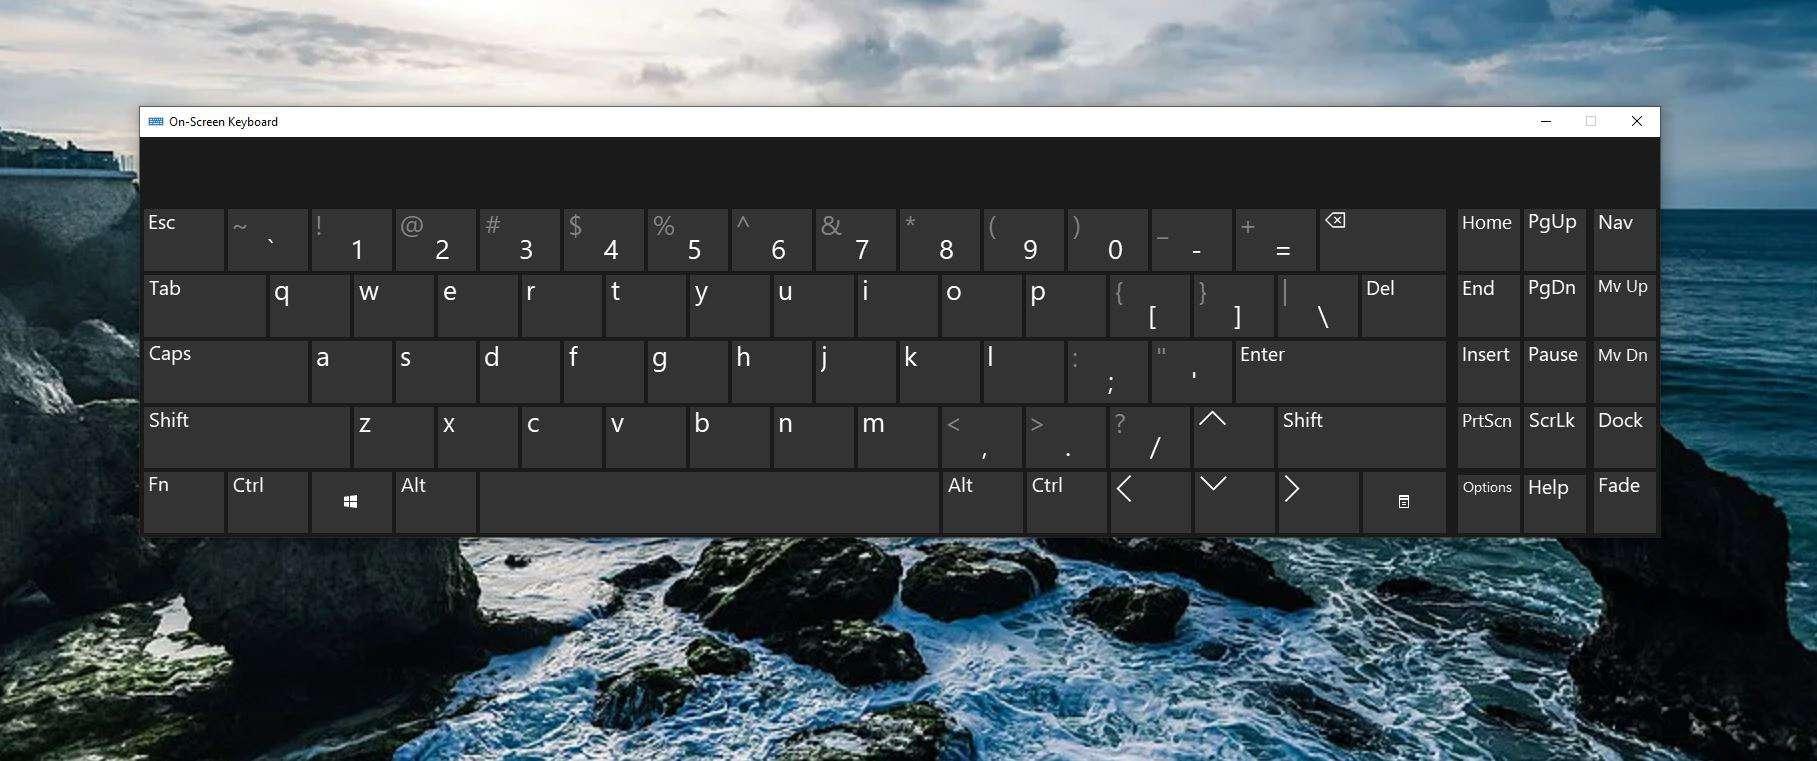 On-screen keyboard in Windows